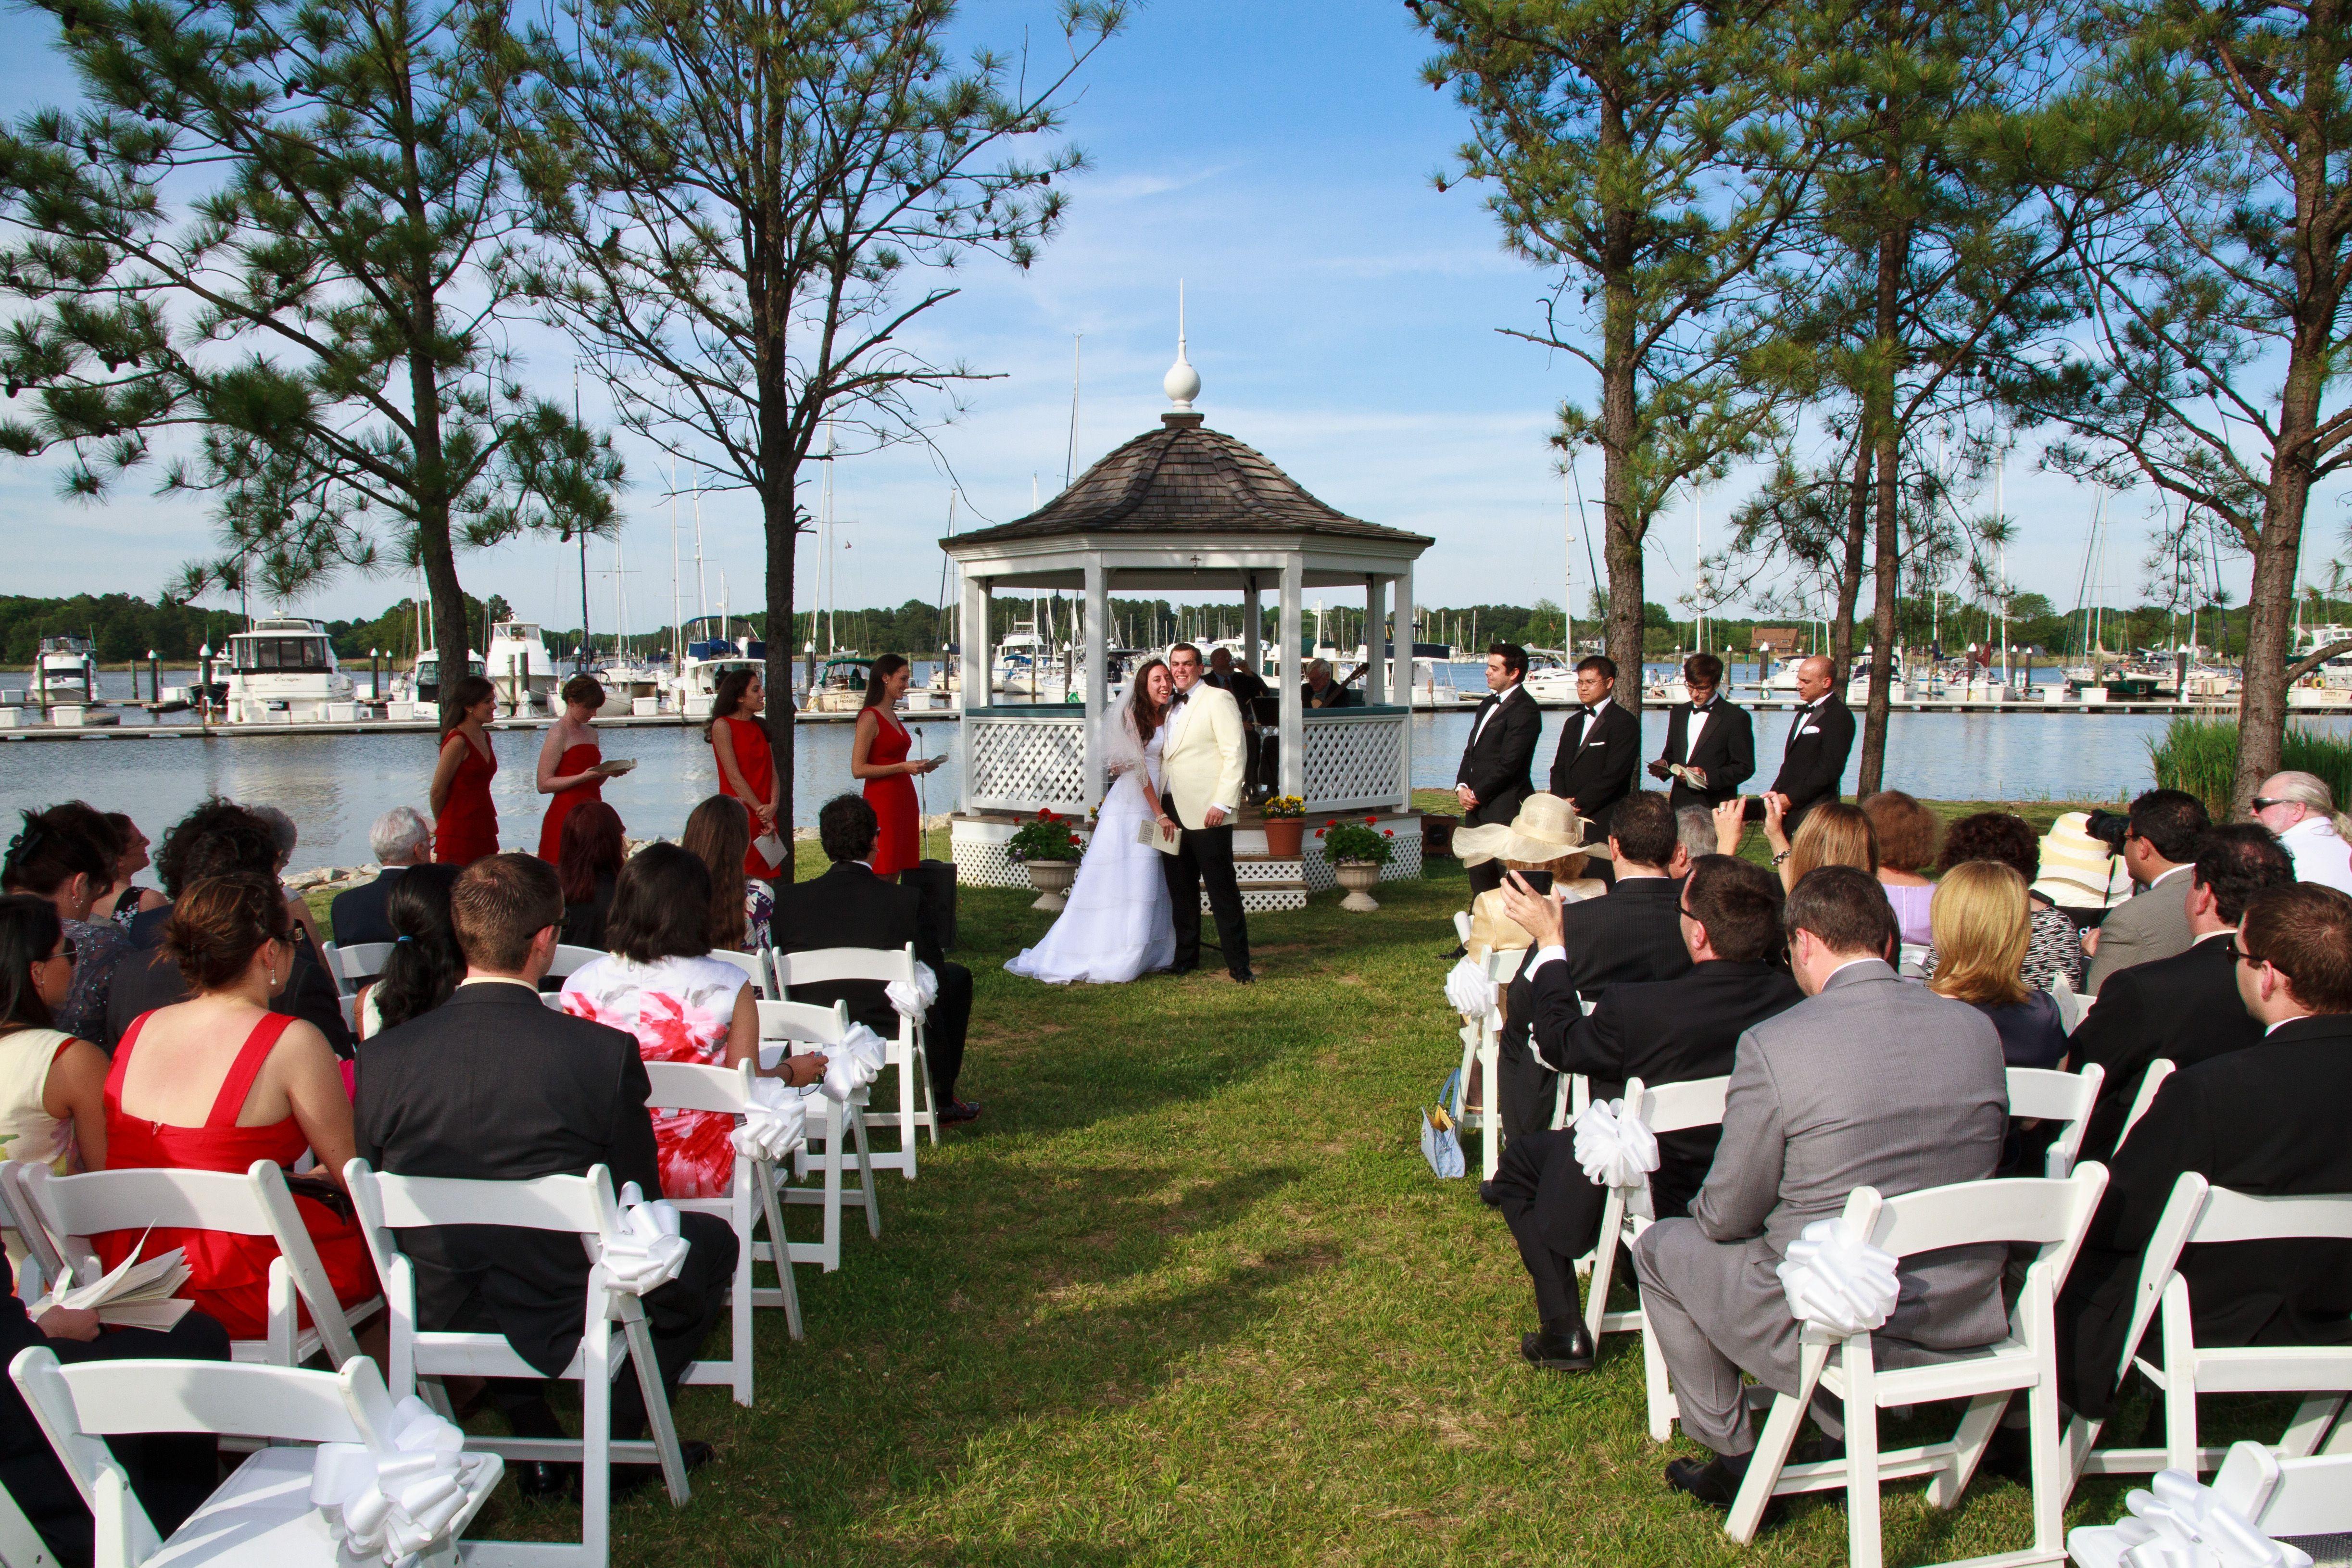 Chesapeake Bay Wedding Venue. Outdoor Wedding. Chesapeake